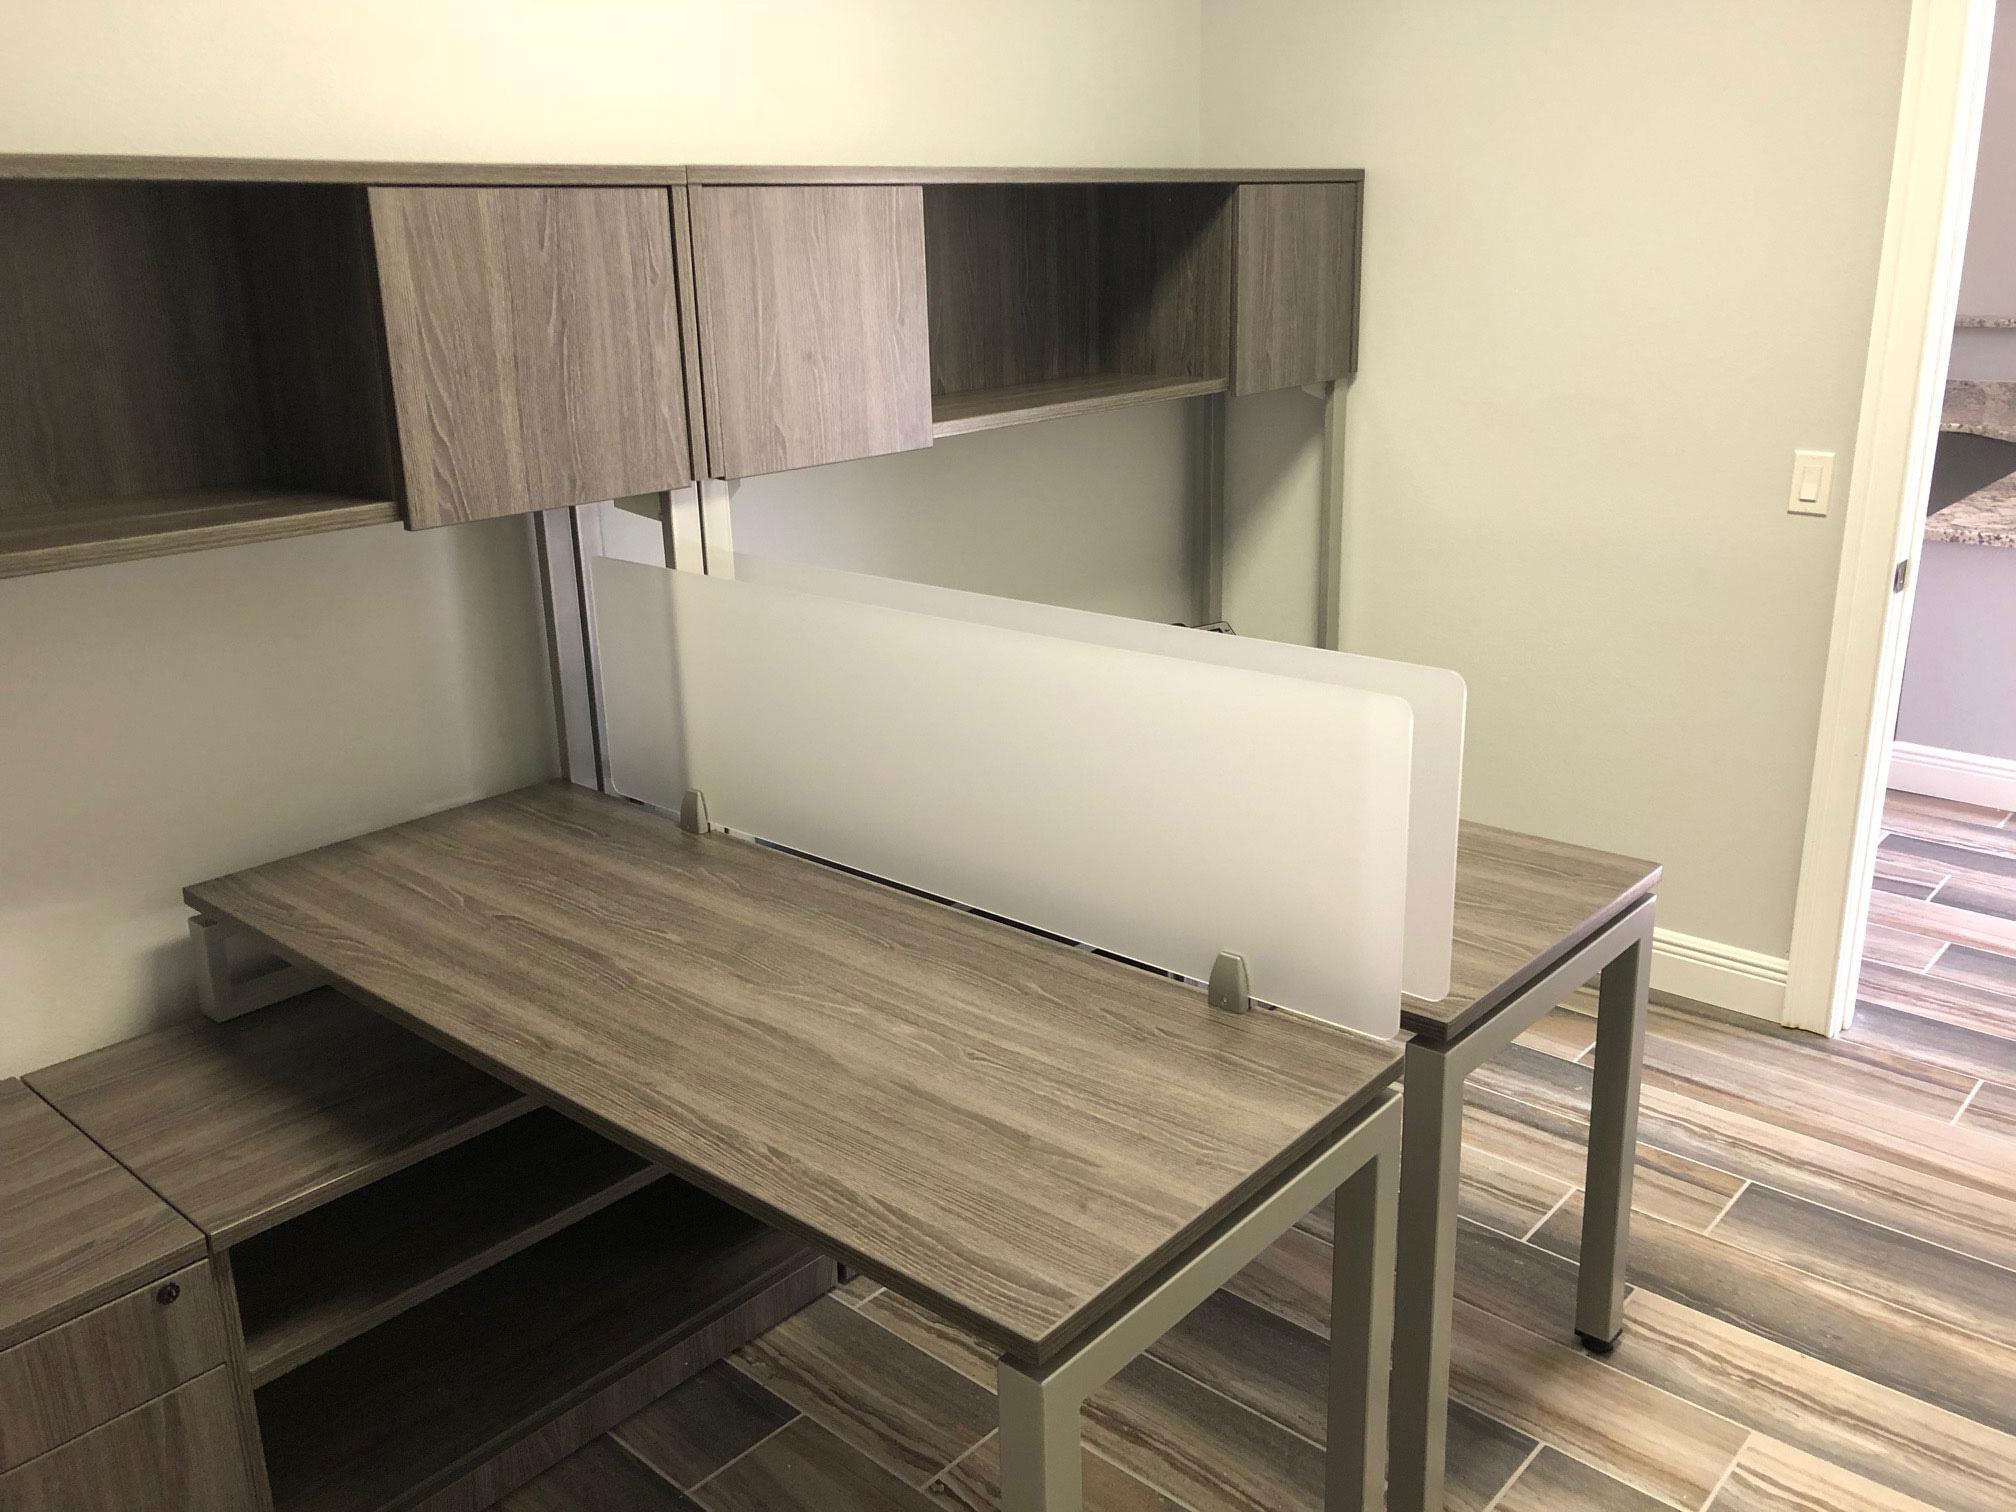 furniture-cubicles-in-tampa-florida-6.jpg